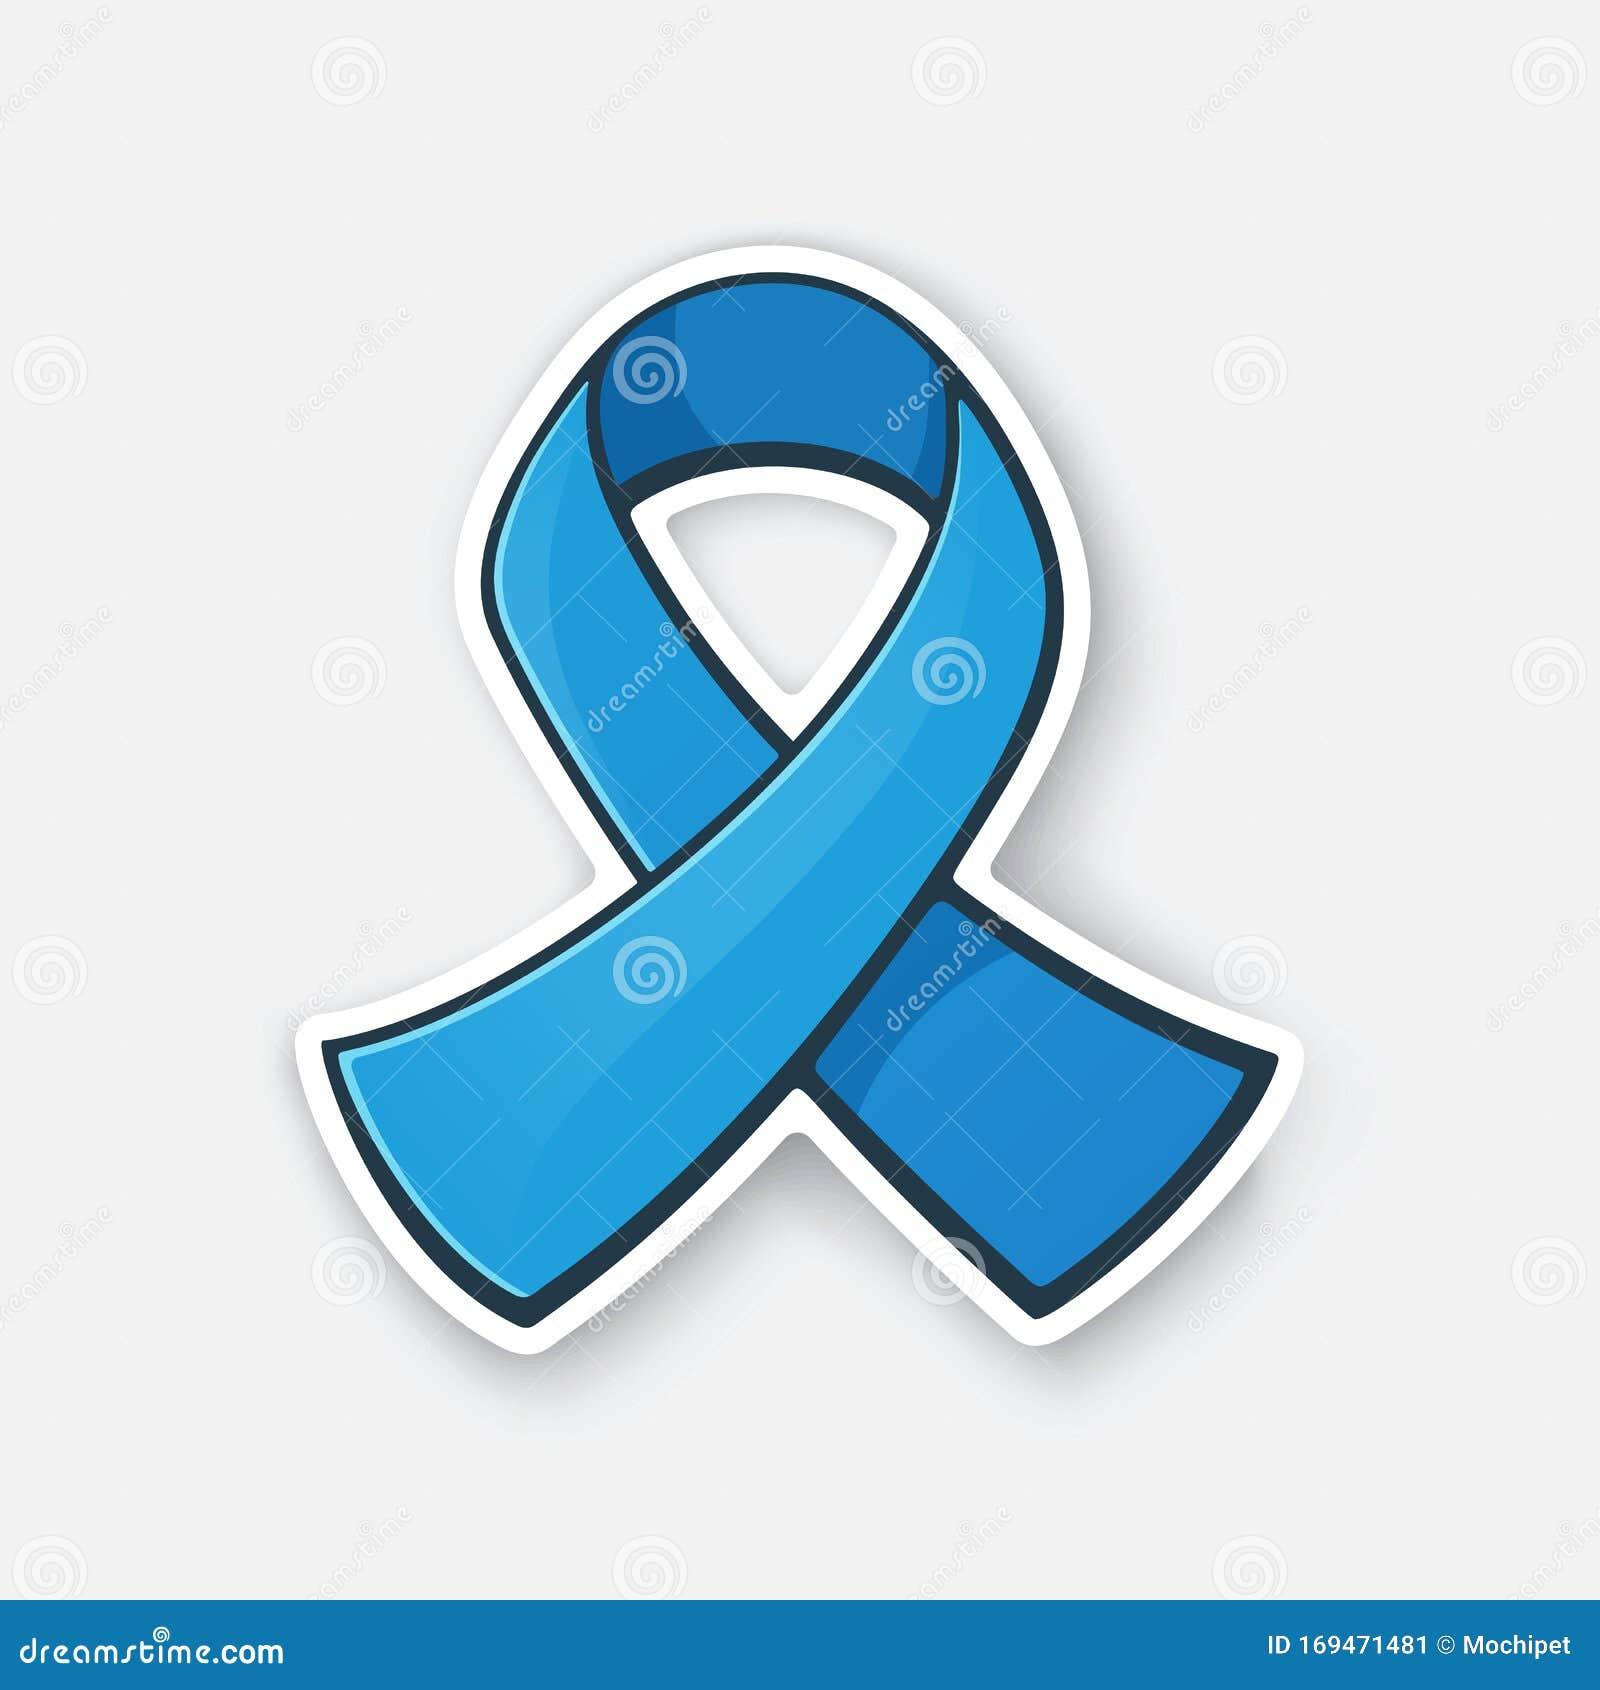 Vector Illustration Ribbon At Blue Color International Symbol Of Colon Cancer Awareness Stock Vector Illustration Of Contour Cancer 169471481